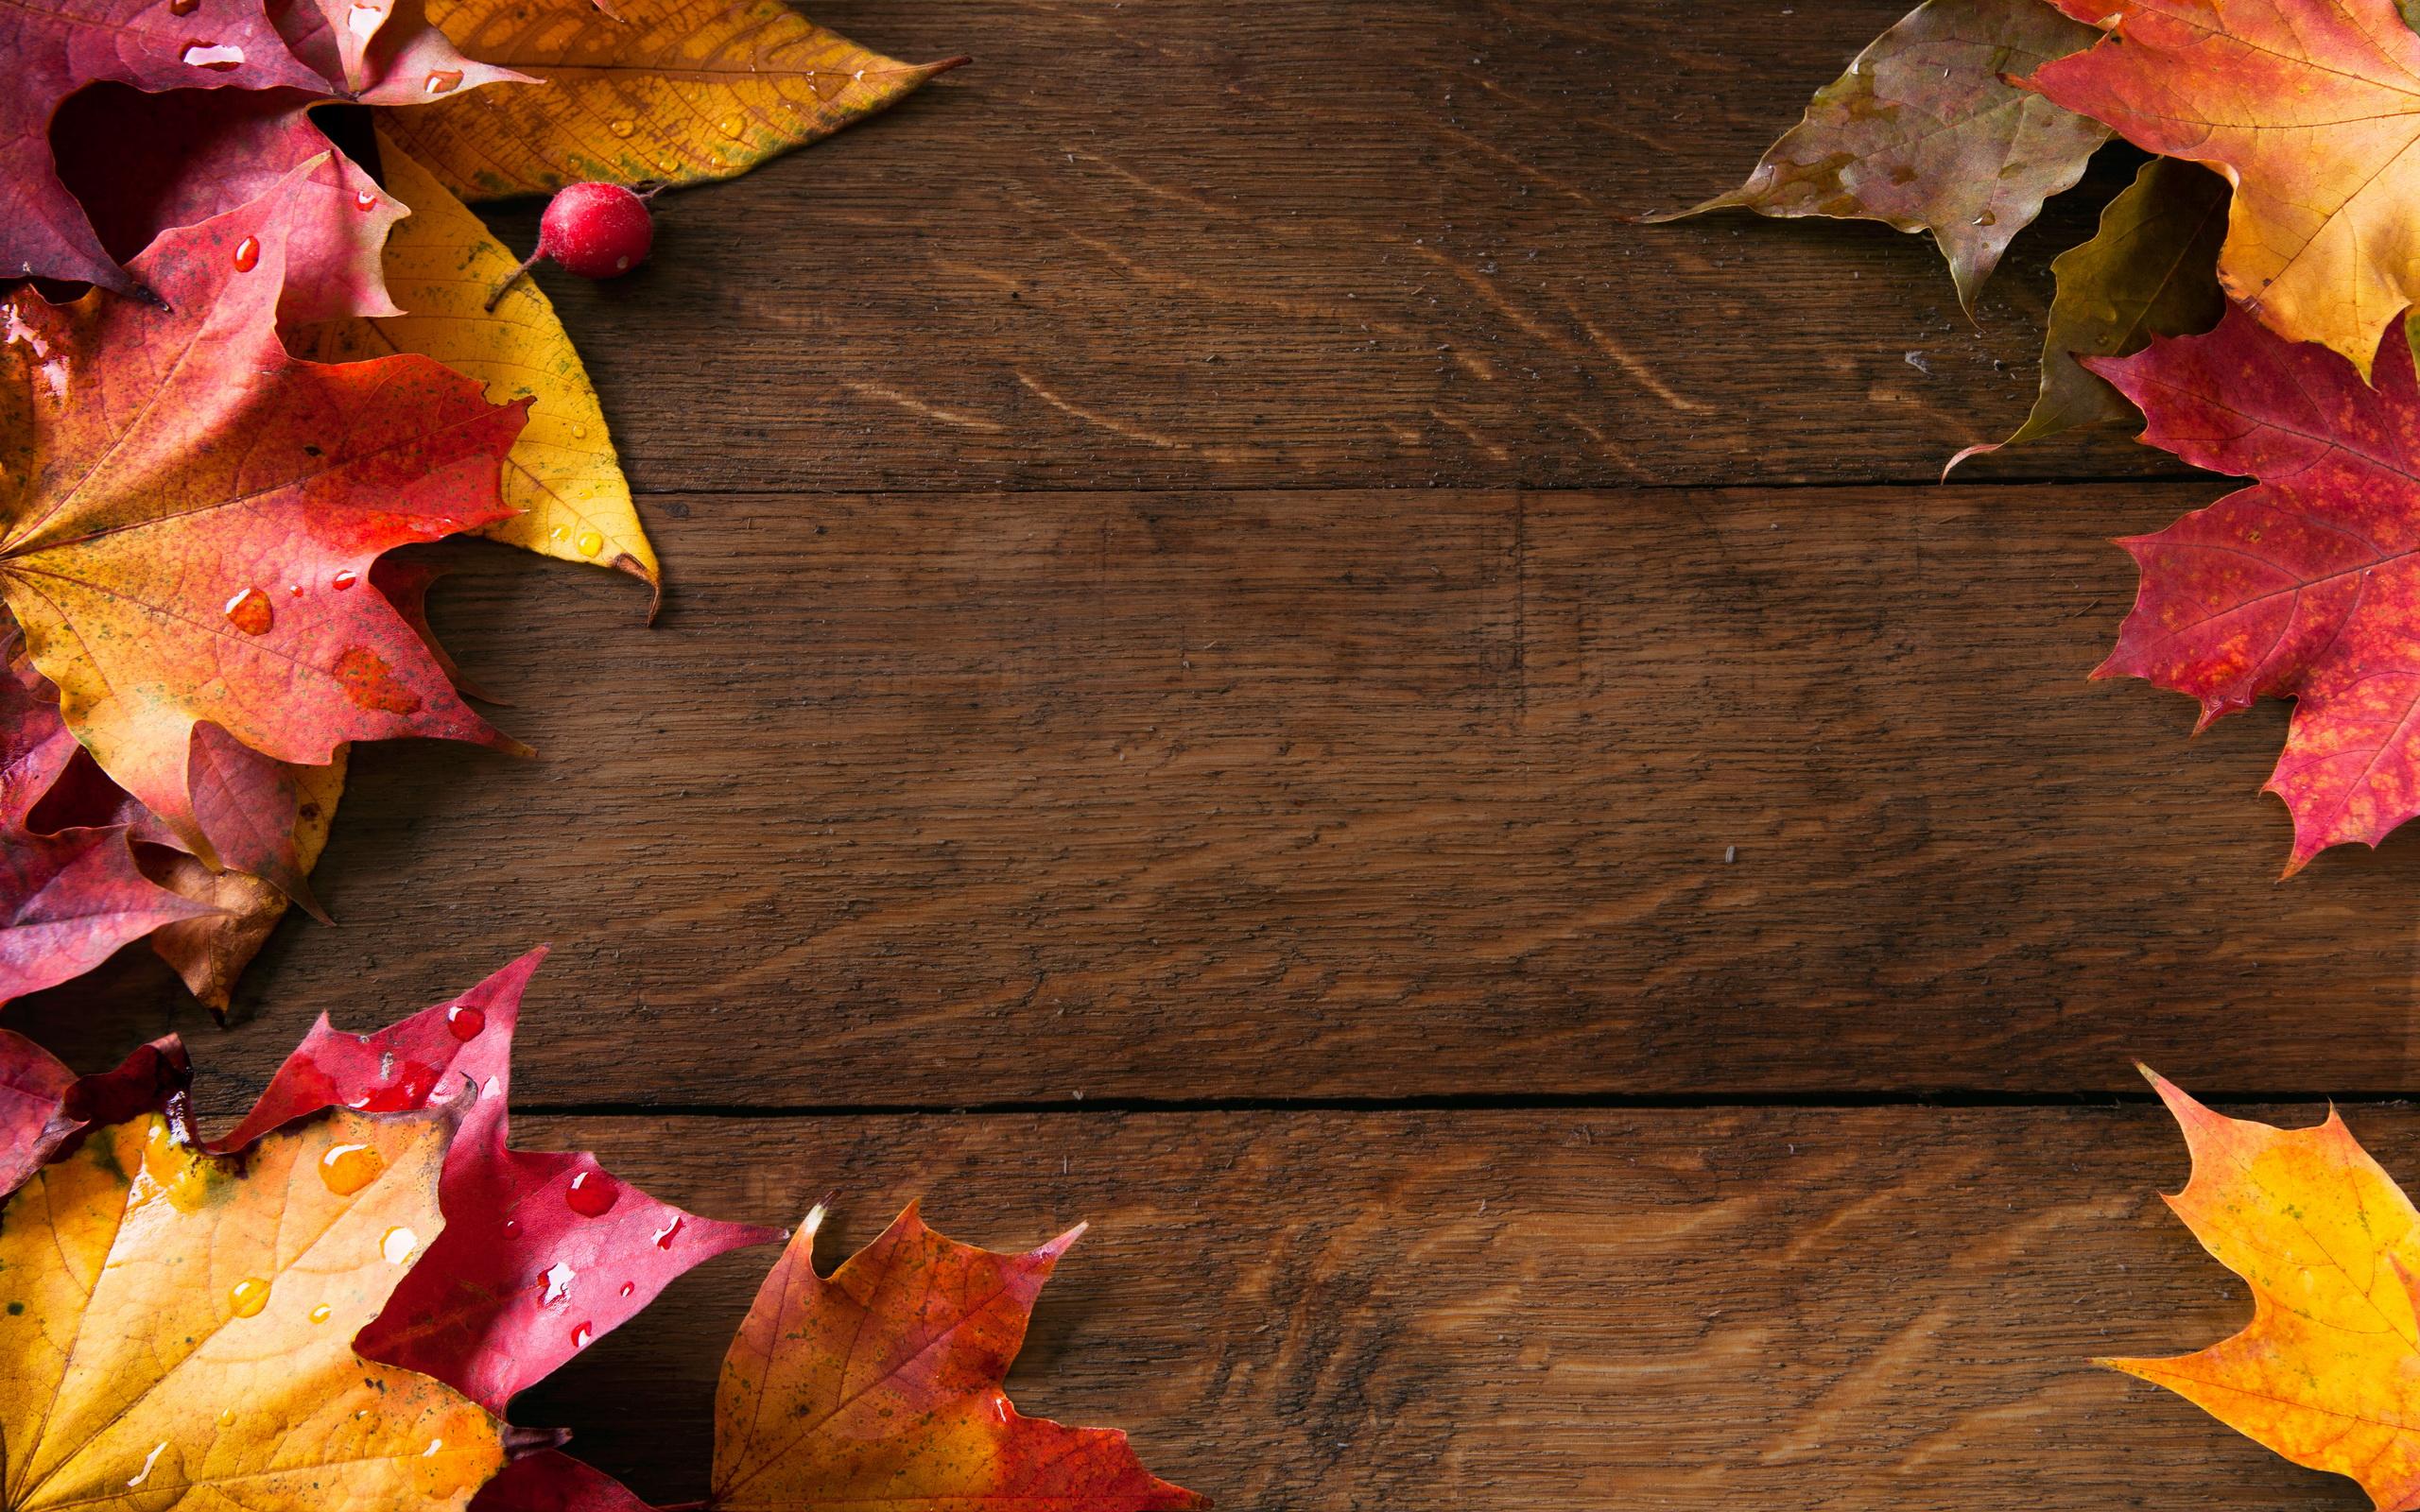 Abstract Autumn Frame Wallpapers HD Autumn Wallpaper